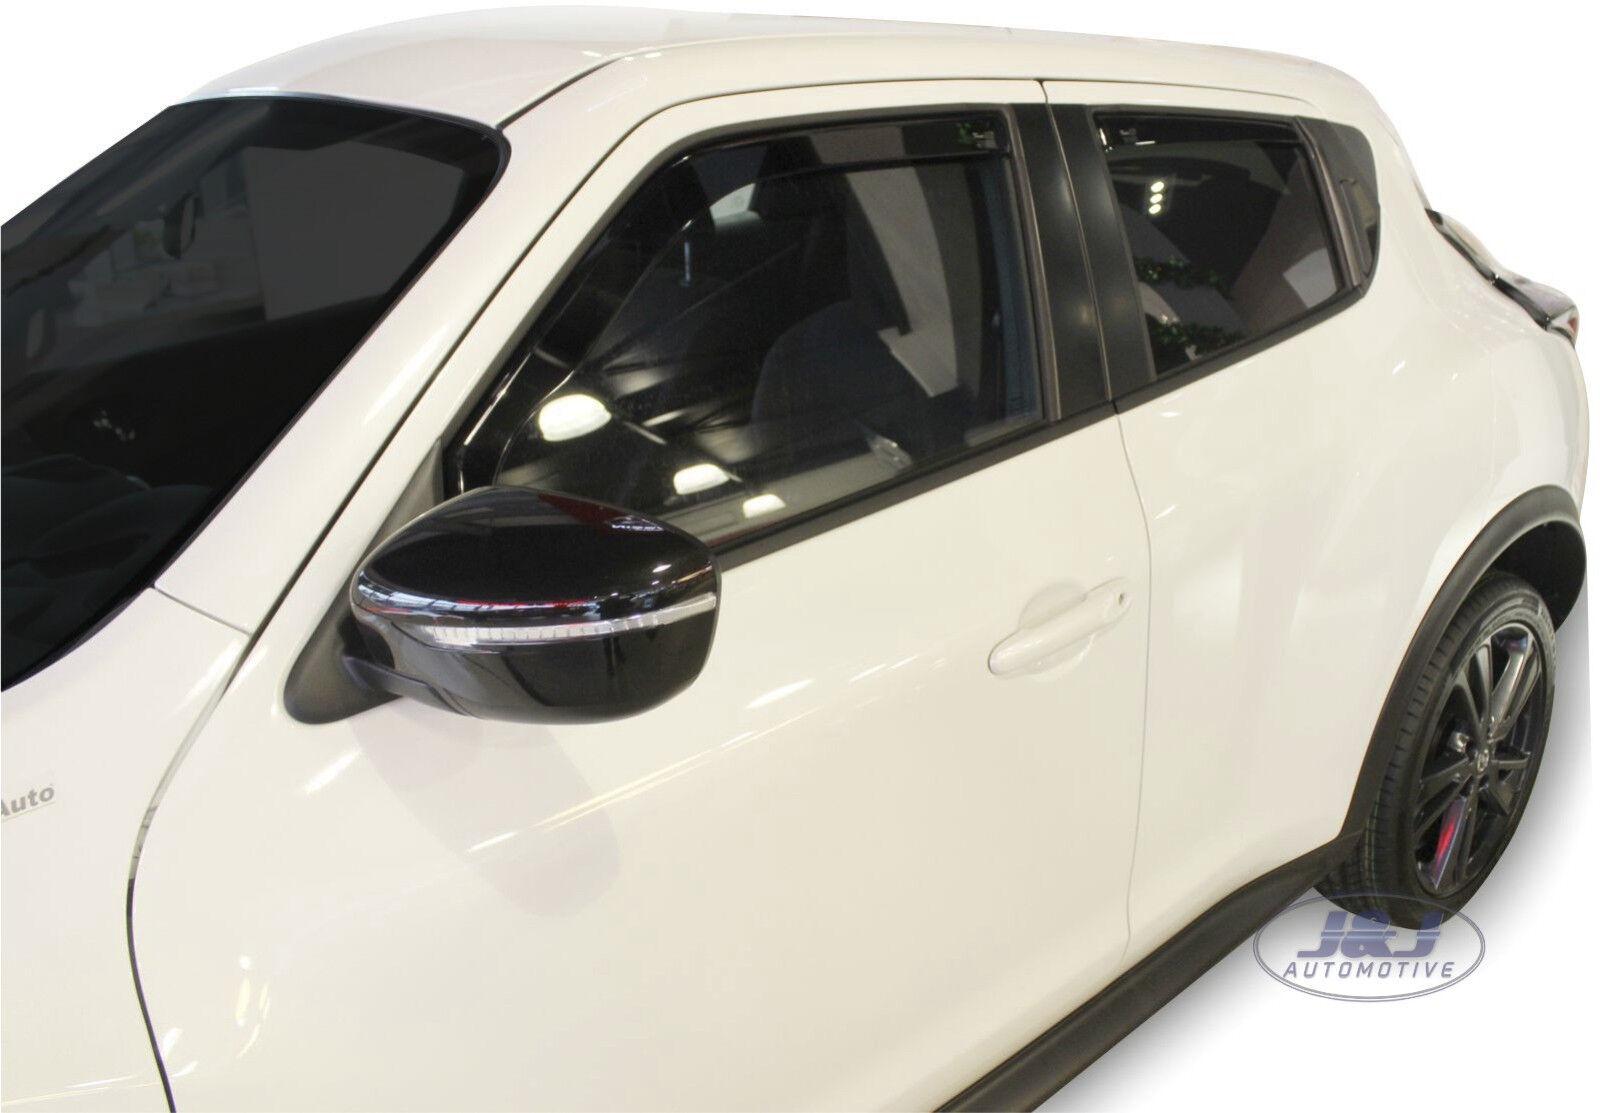 J/&J AUTOMOTIVE DEFLETTORI ARIA ANTITURBO Nissan Juke 2010-2018 4 pezzi